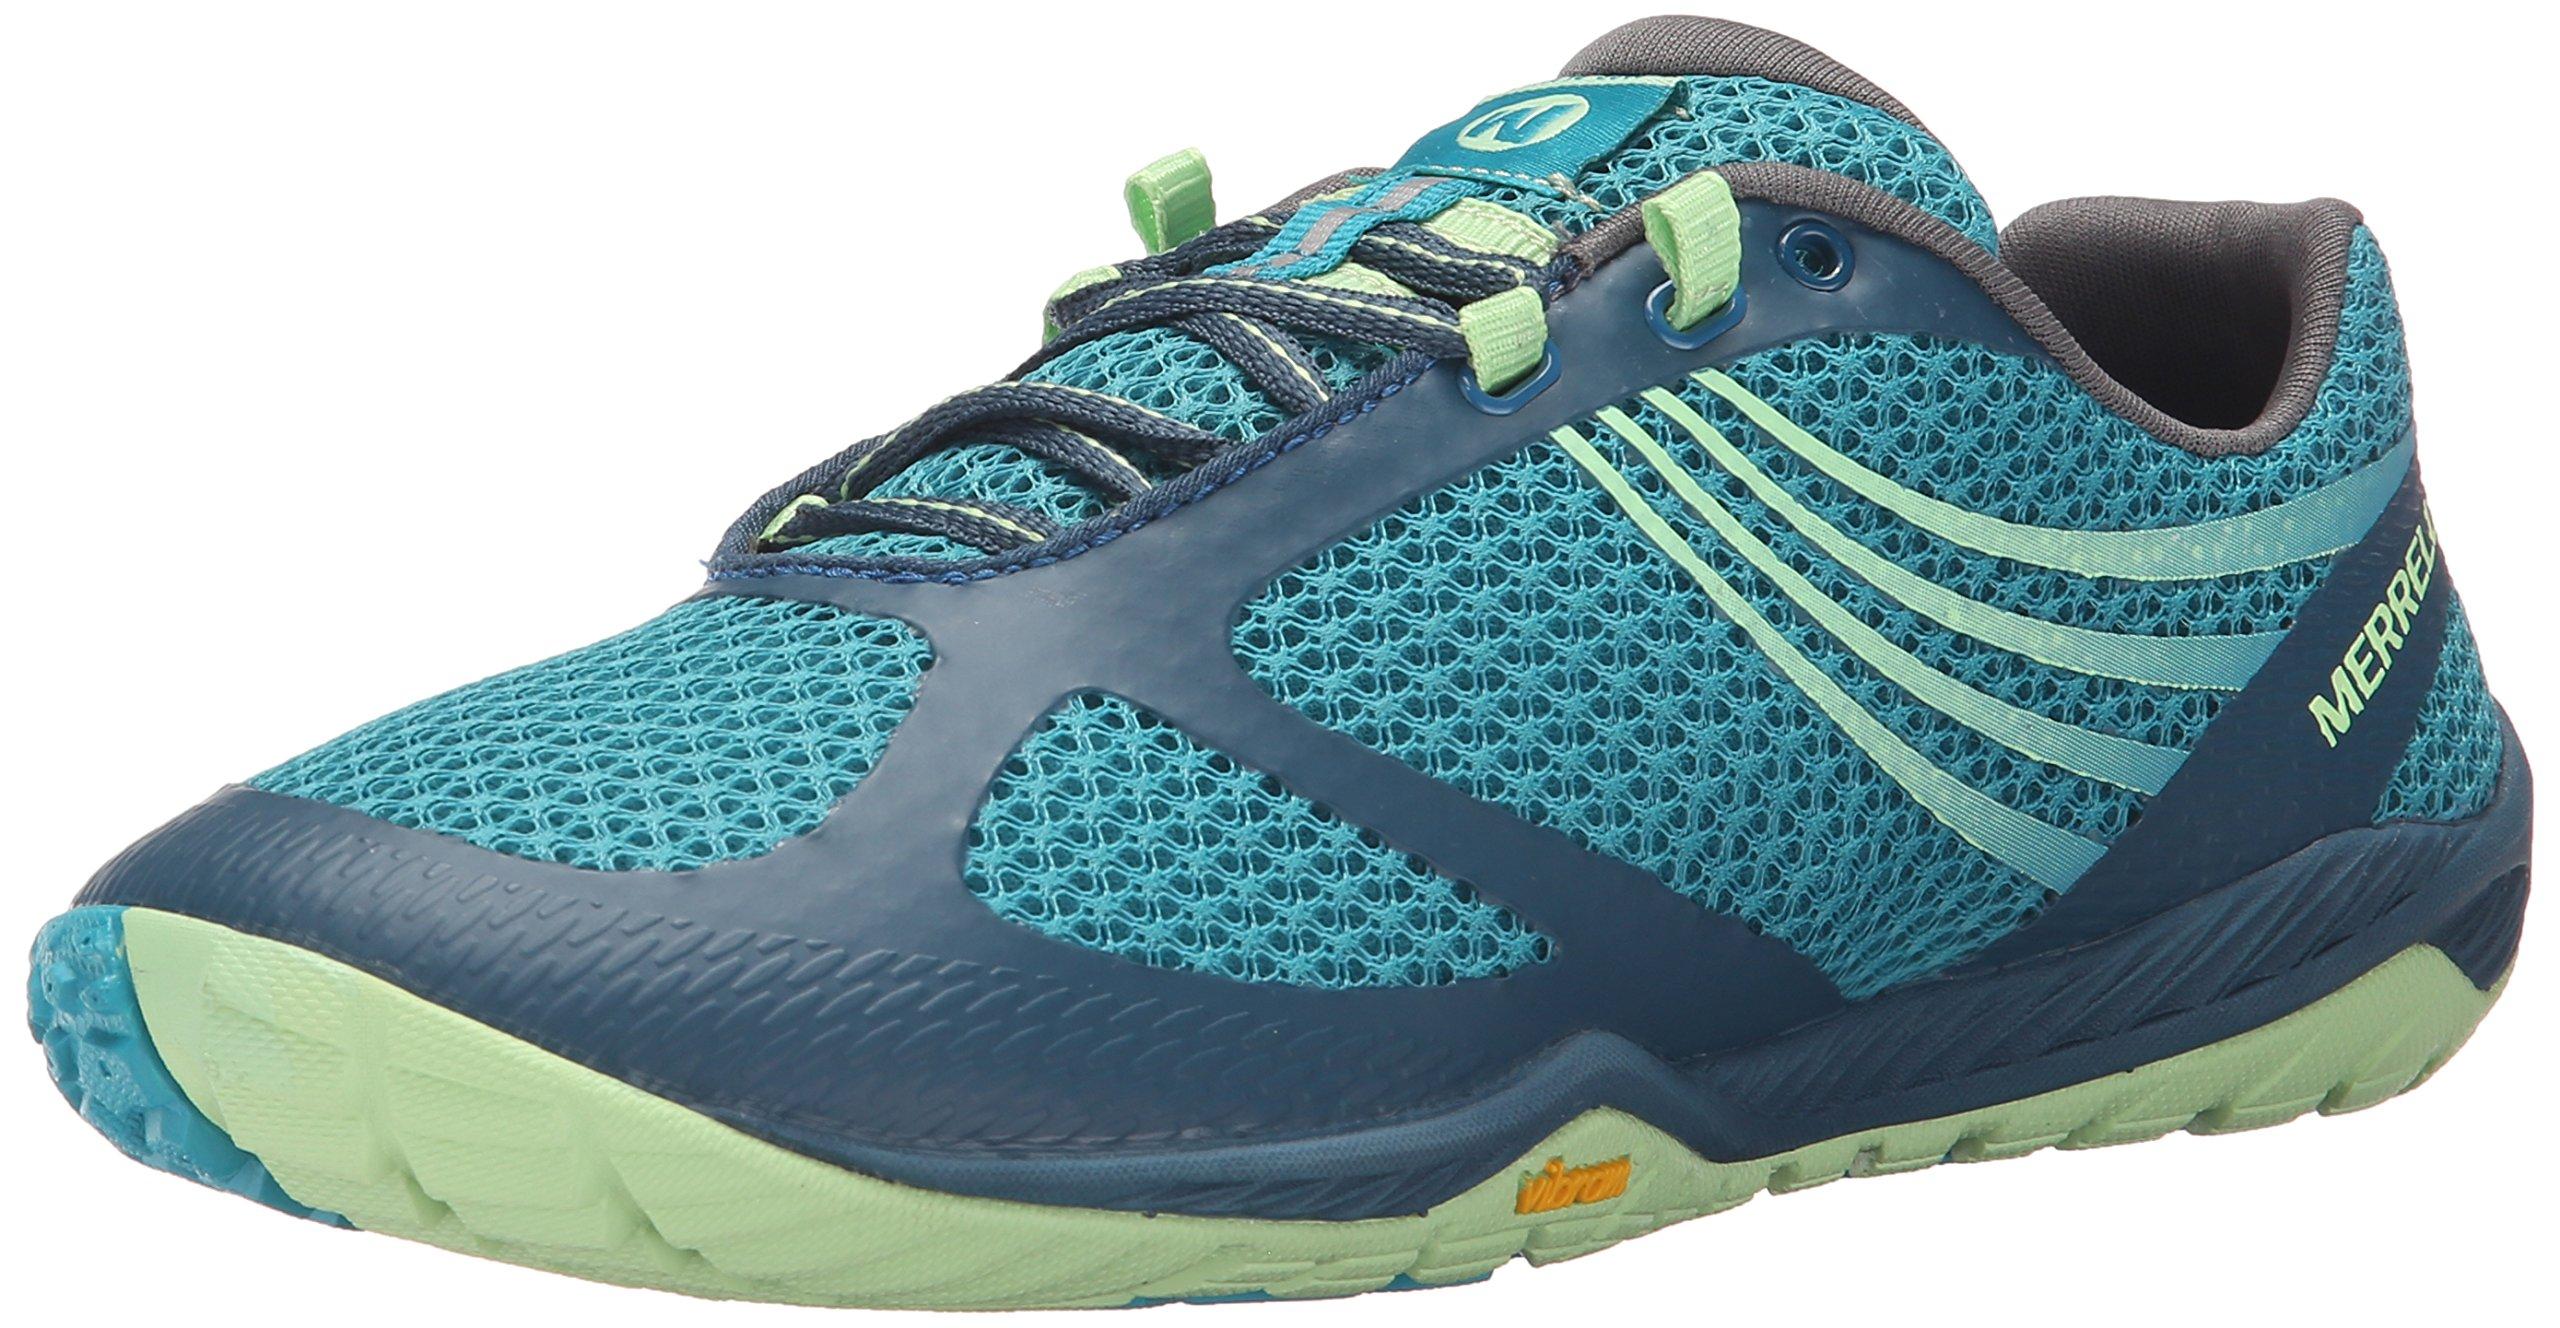 Merrell Women's Pace Glove 3 Trail Running Shoe, Turquoise, 8.5 M US